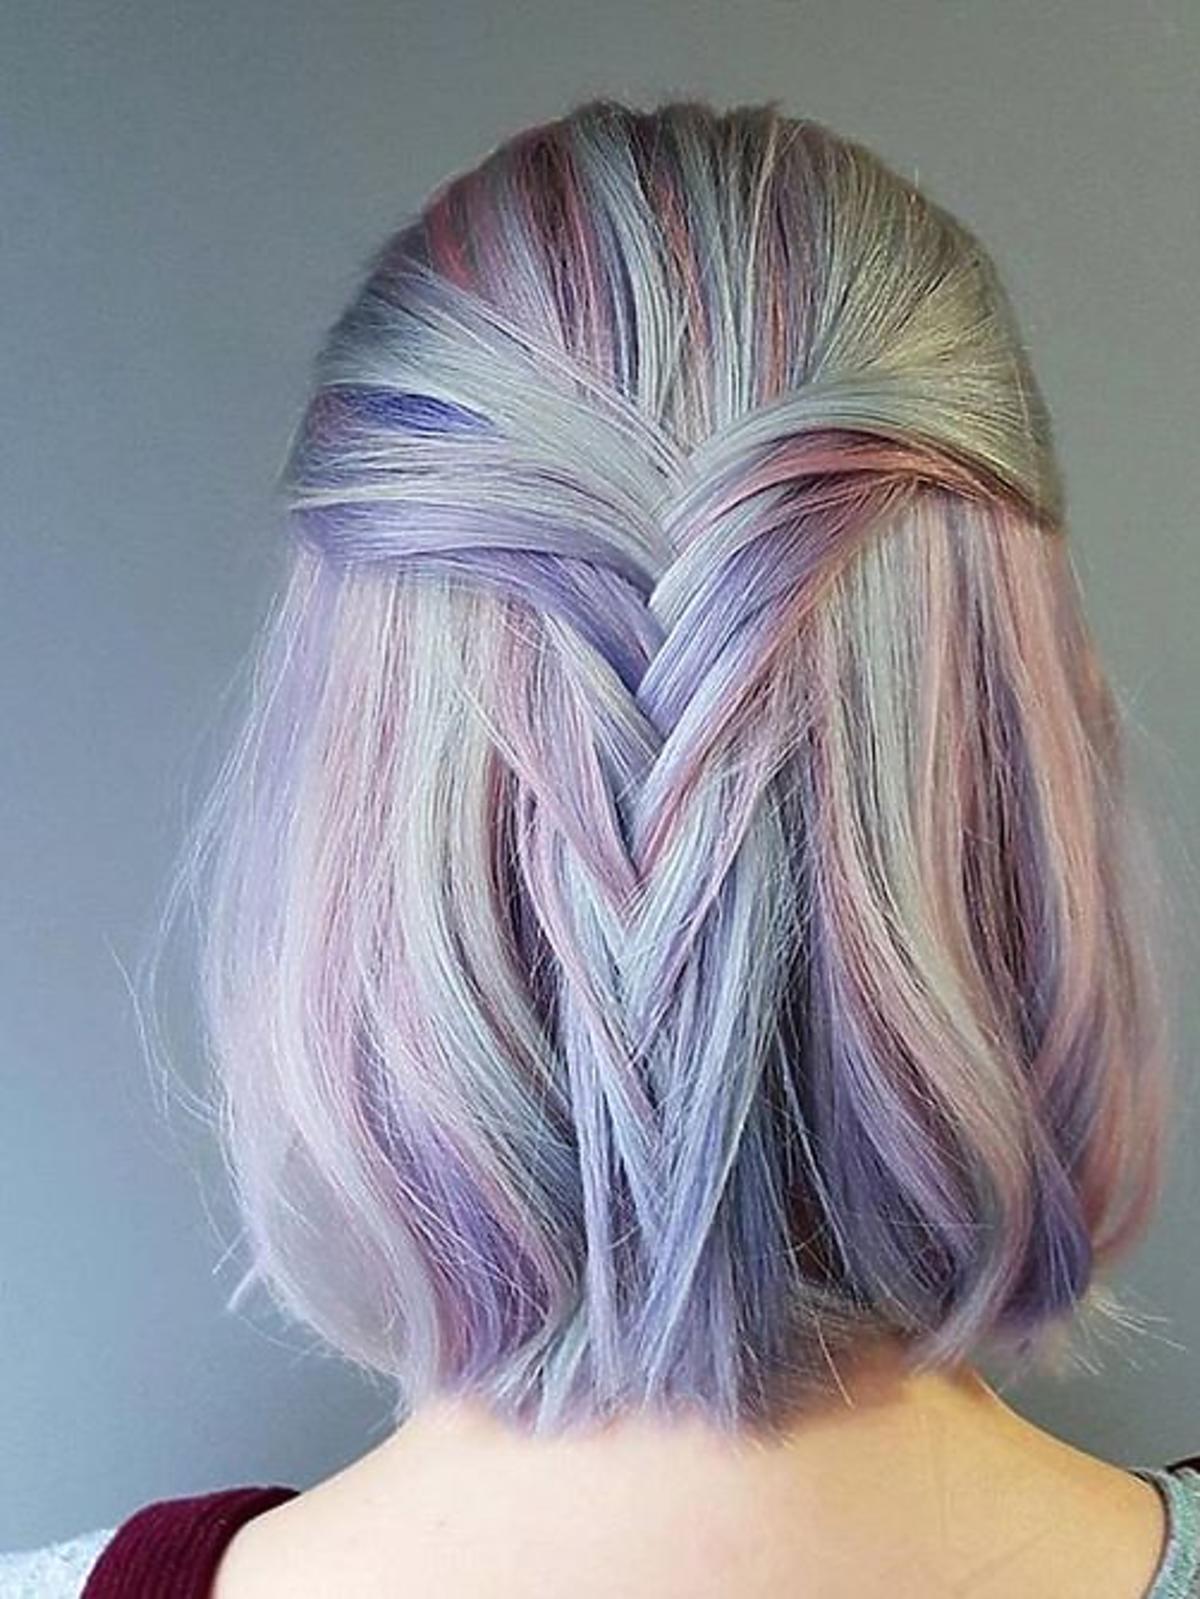 Frappuccino hair